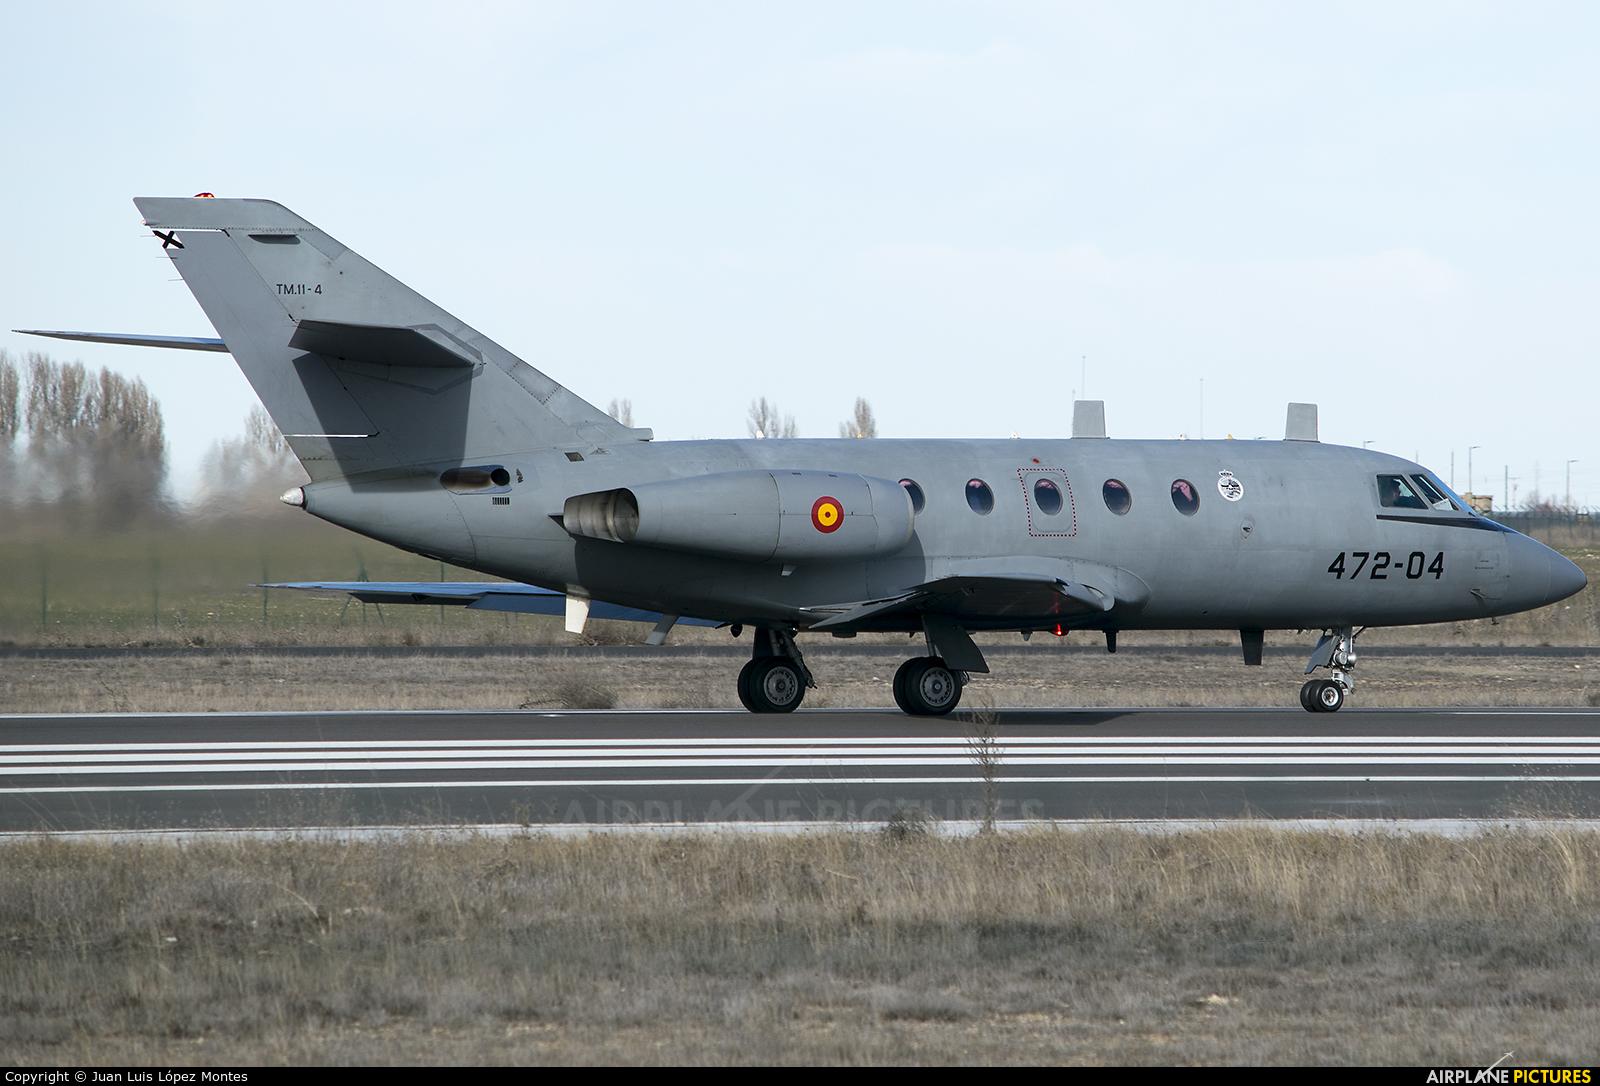 Spain - Air Force TM.11-4 aircraft at Valladolid - Villanubla